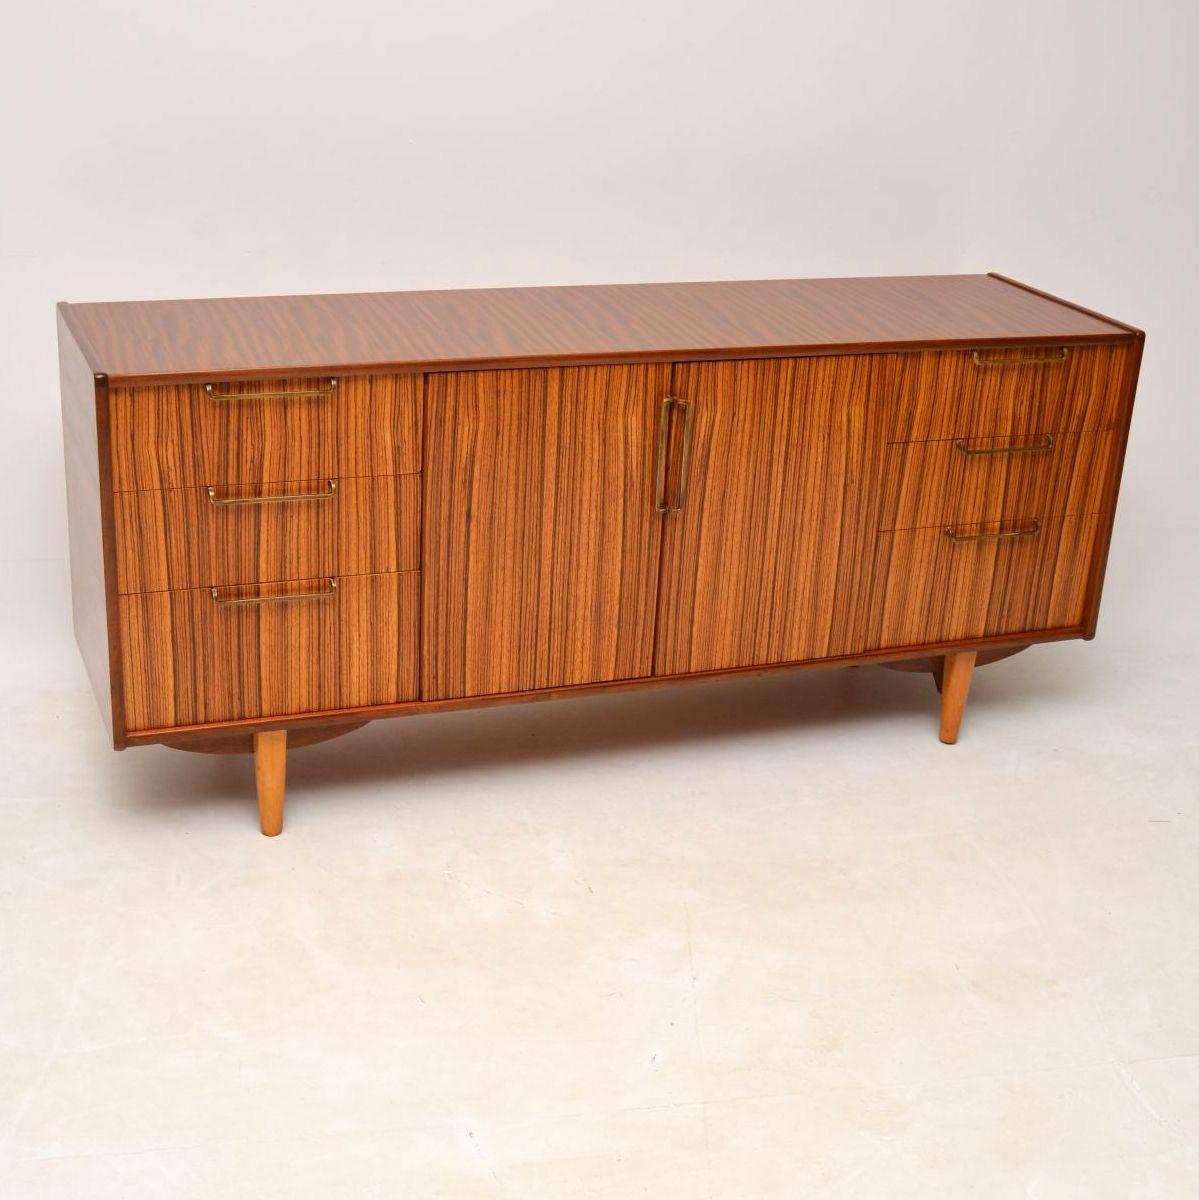 vintage_retro_zebrano_walnut_rosewood_sideboard_6